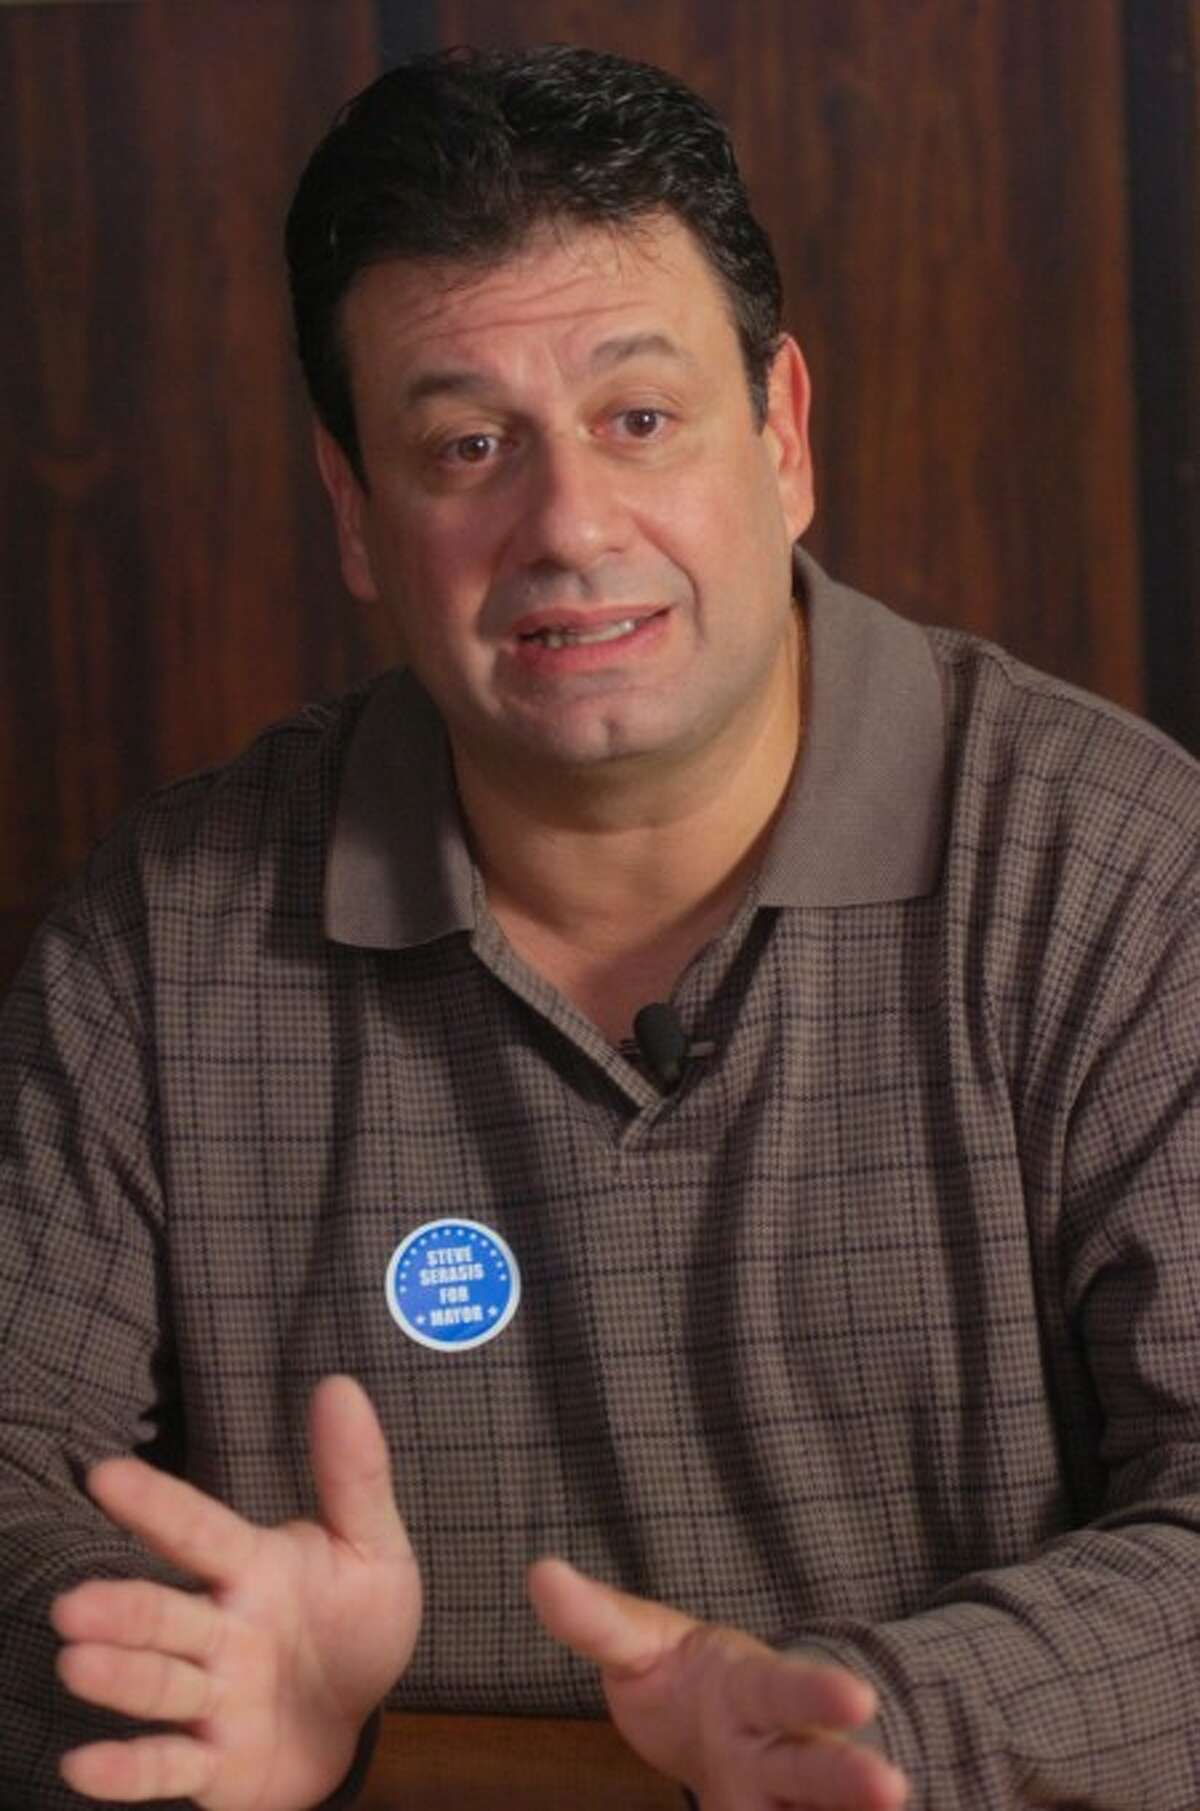 Democratic mayoral candidate Steven Serasis. Hour photo / Erik Trautmann